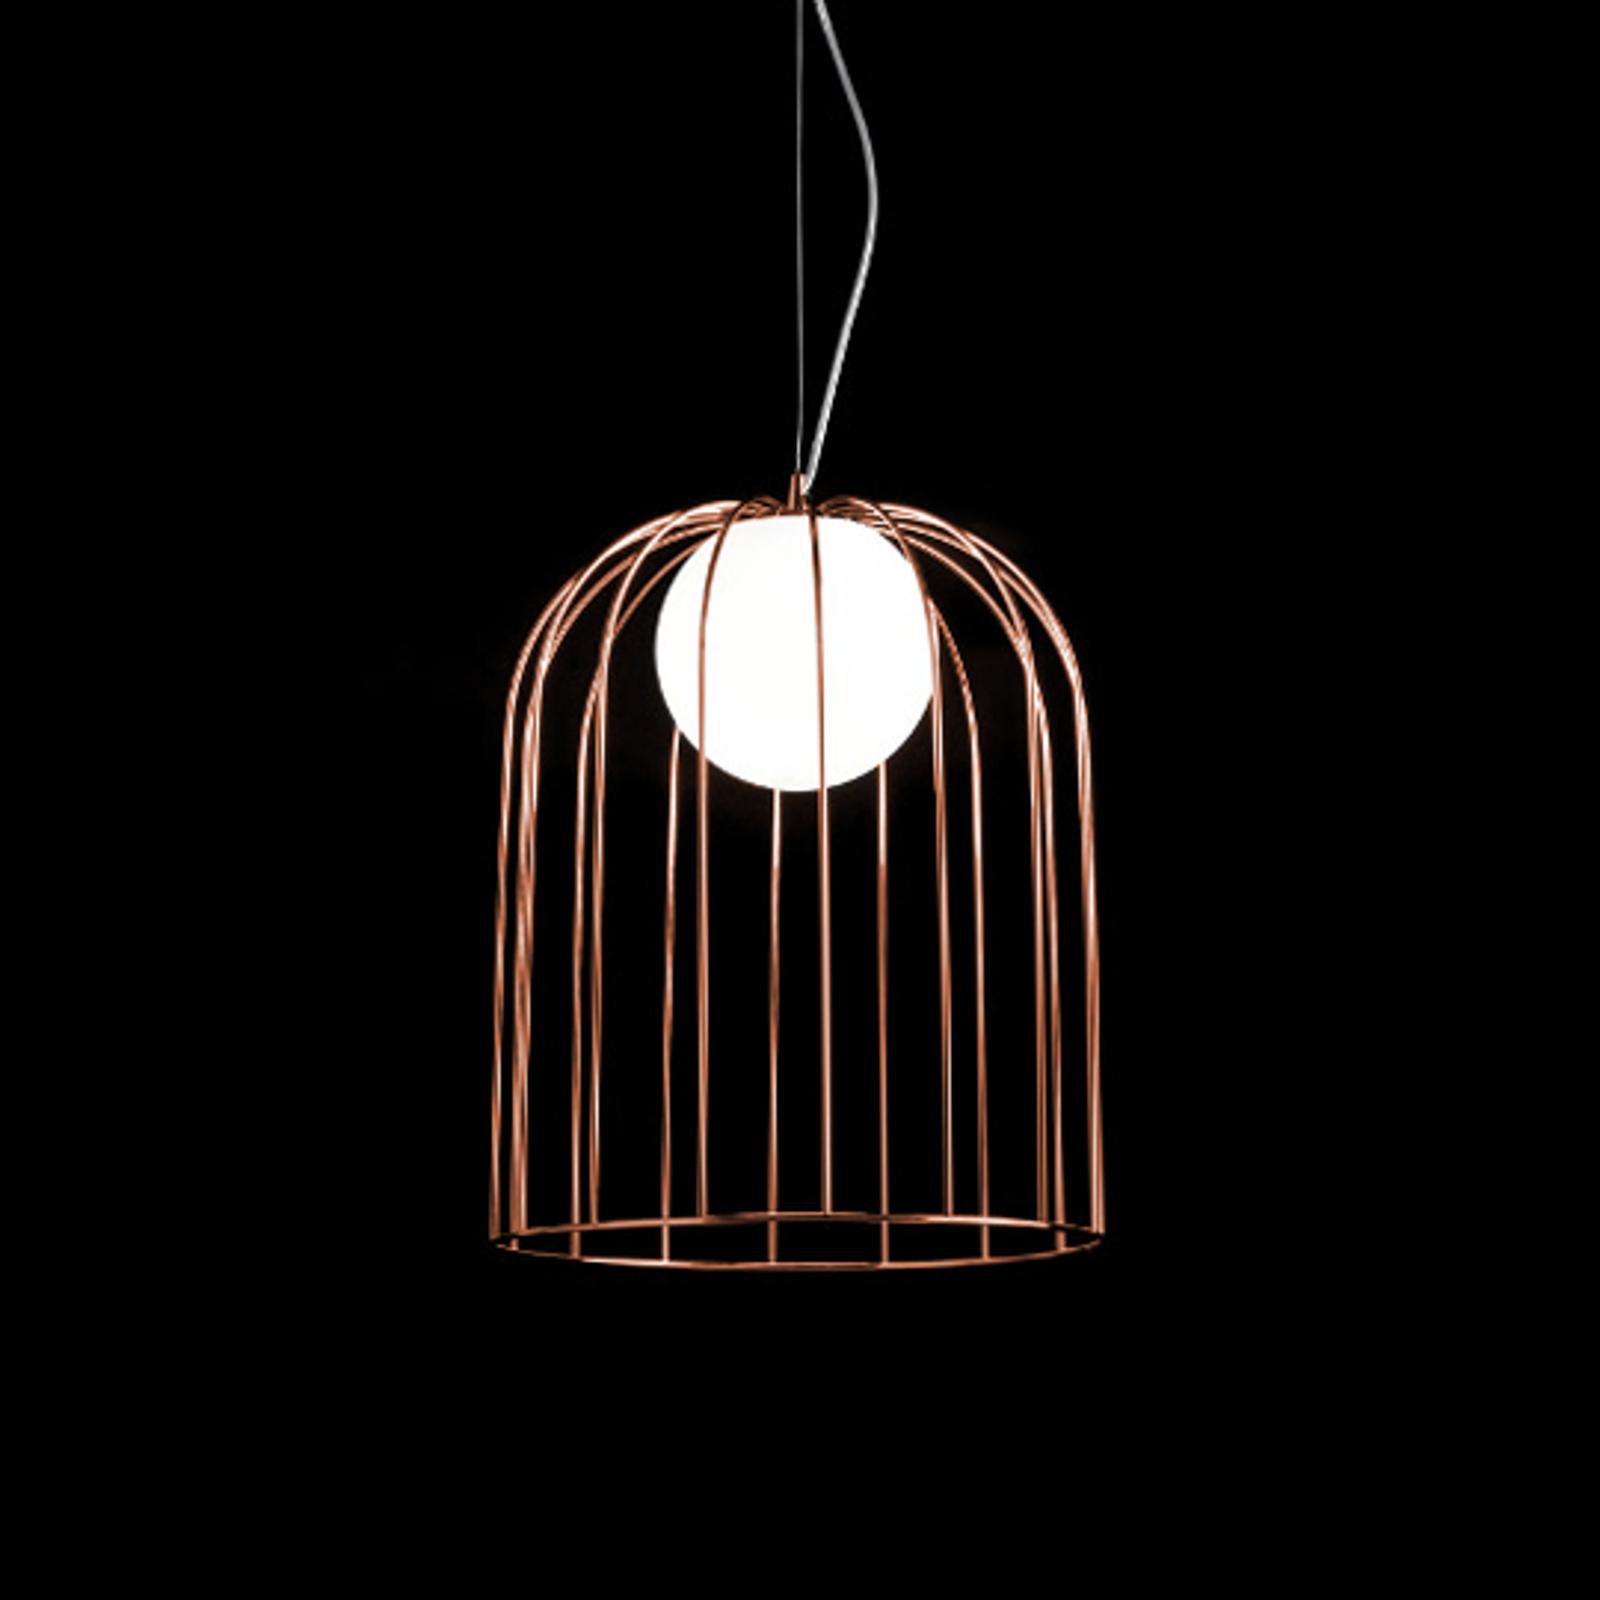 Kap met koperen kleur - designer hanglamp Kluvi